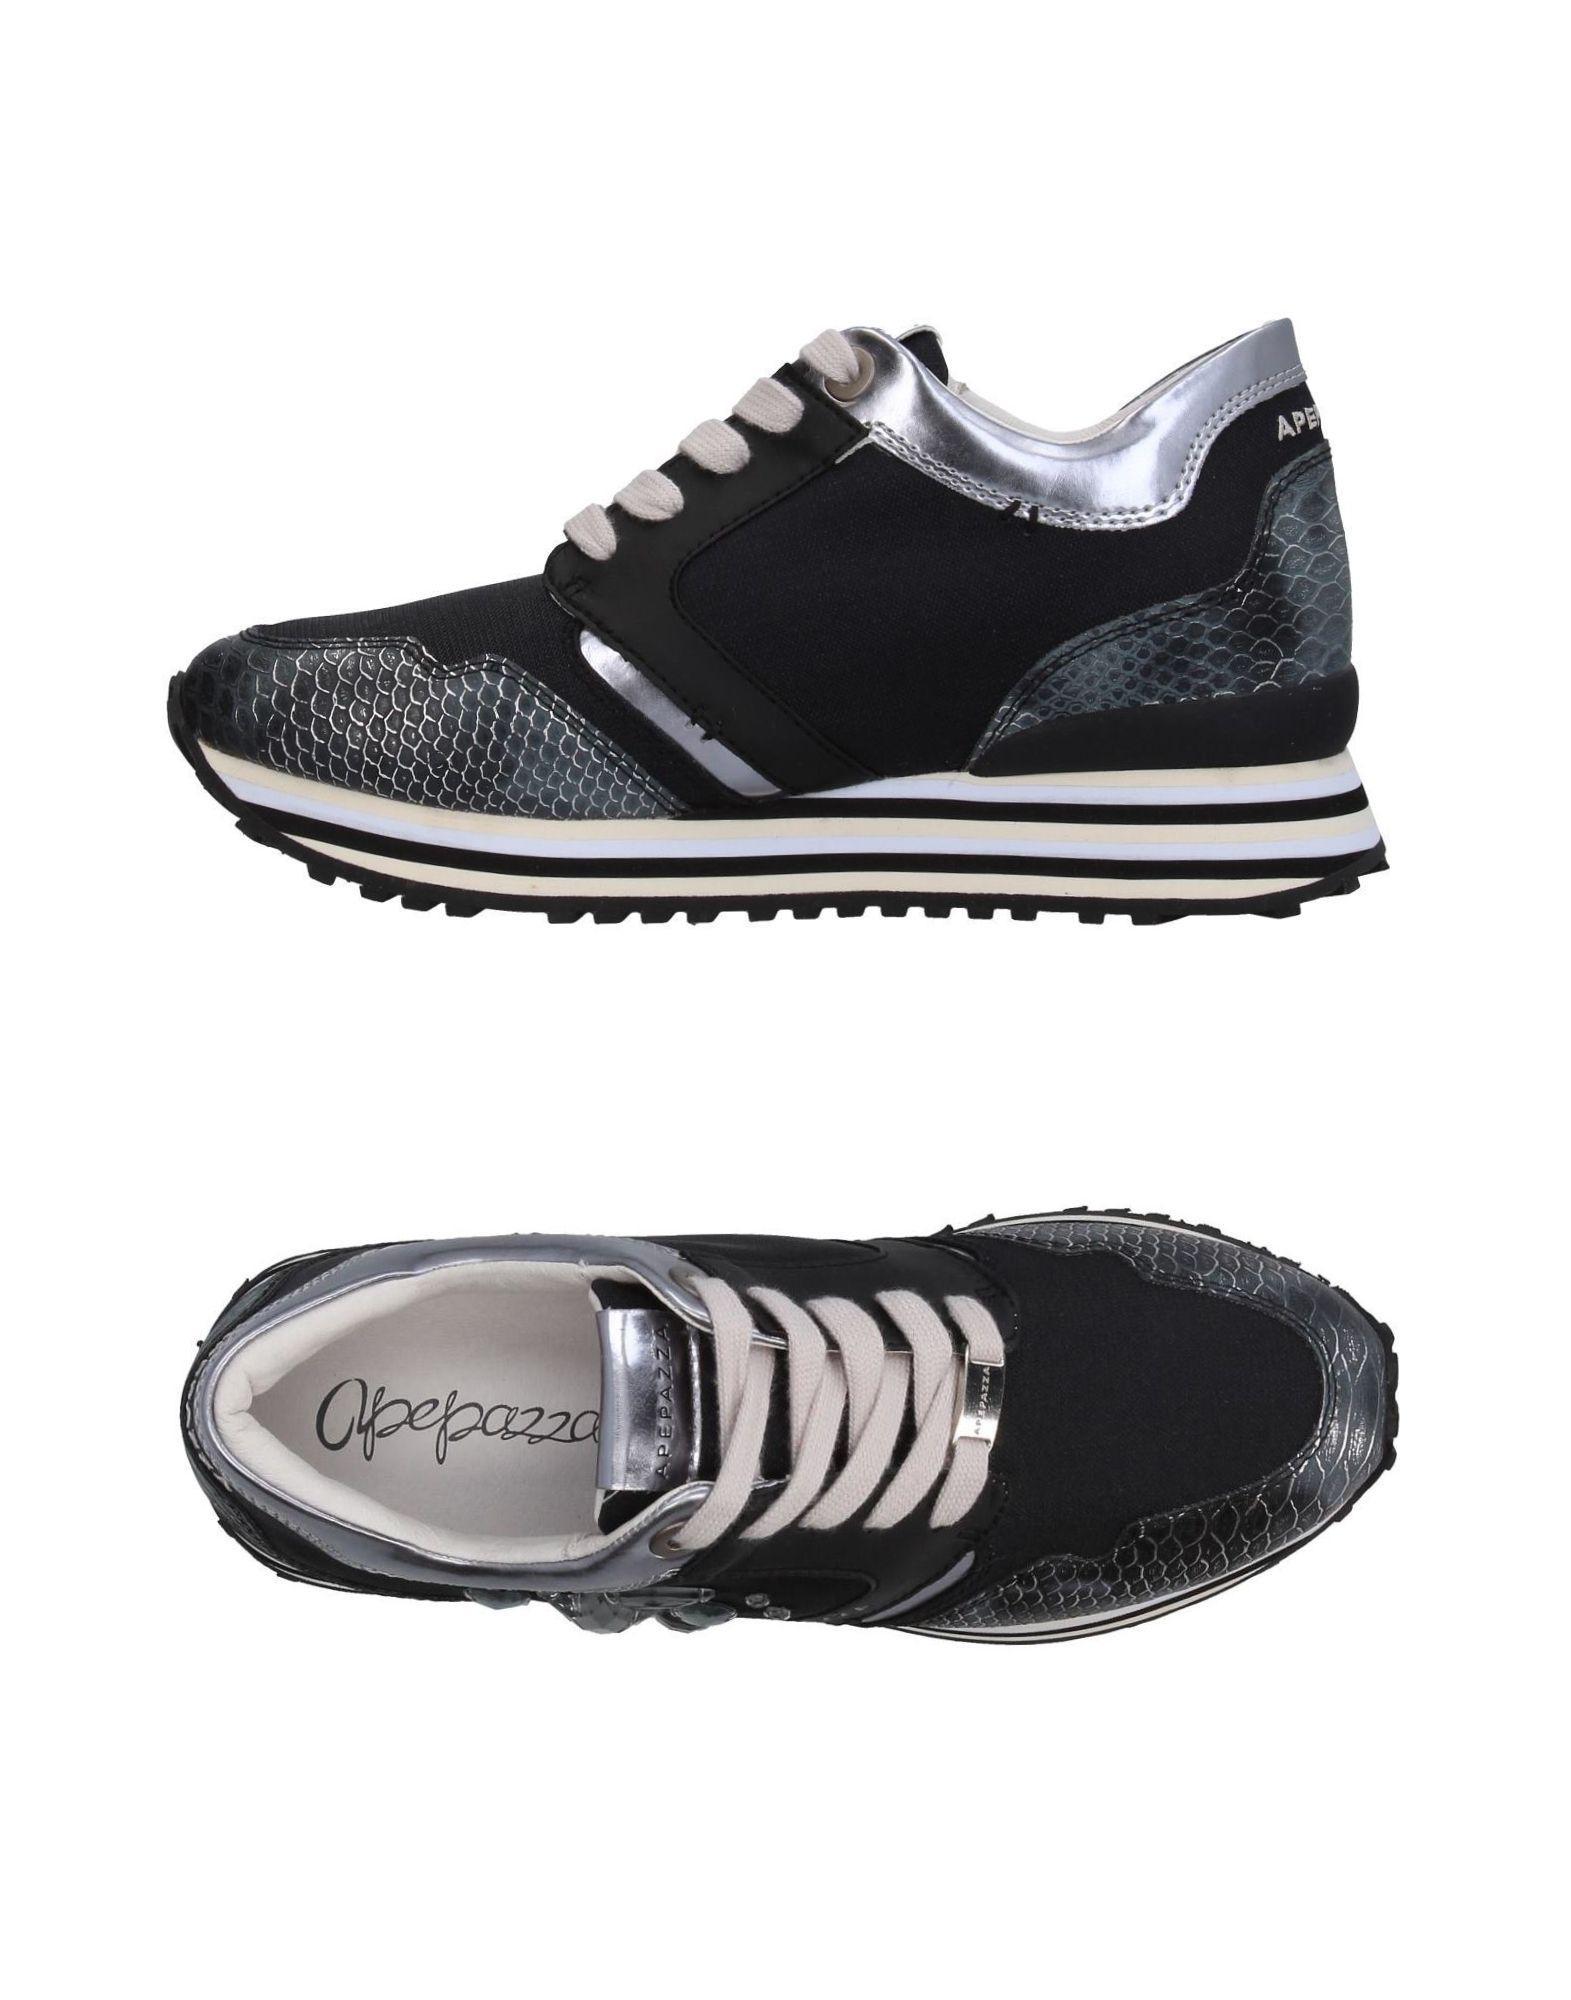 FOOTWEAR - Low-tops & sneakers Apepazza 0mmS5Ak8